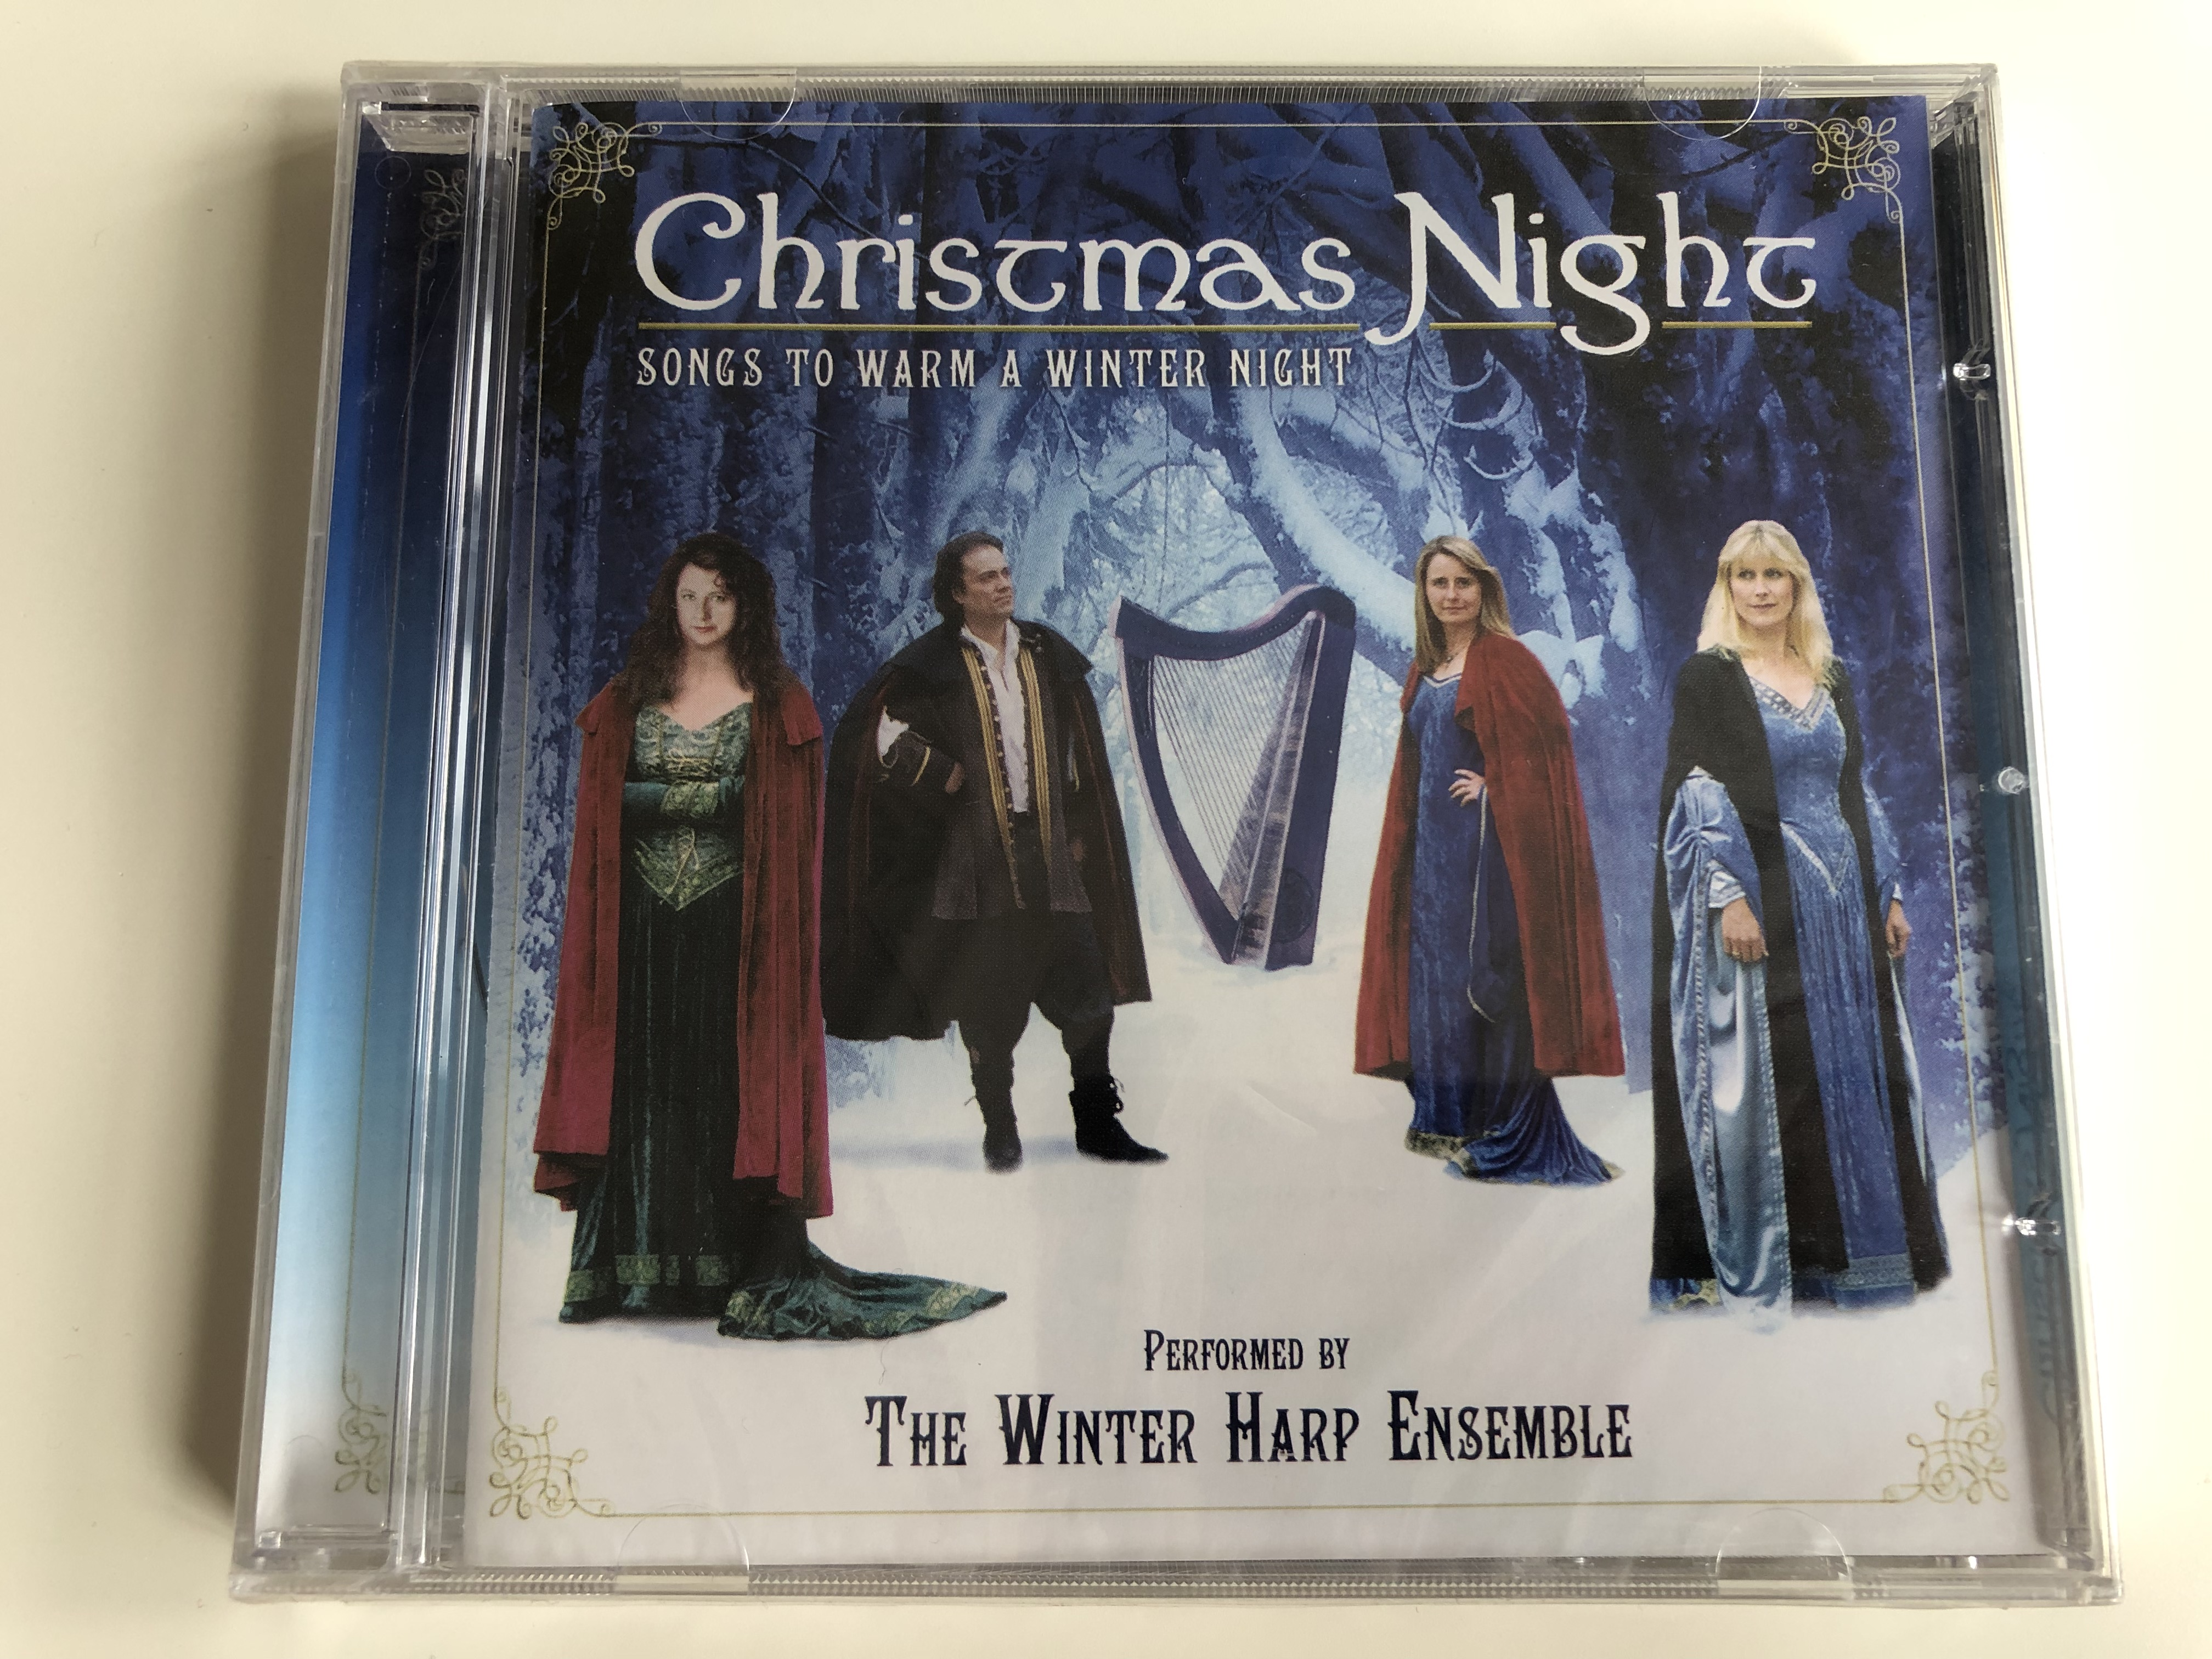 christmas-night-songs-to-warm-a-winter-nightchristmas-nightimg-1554.jpg